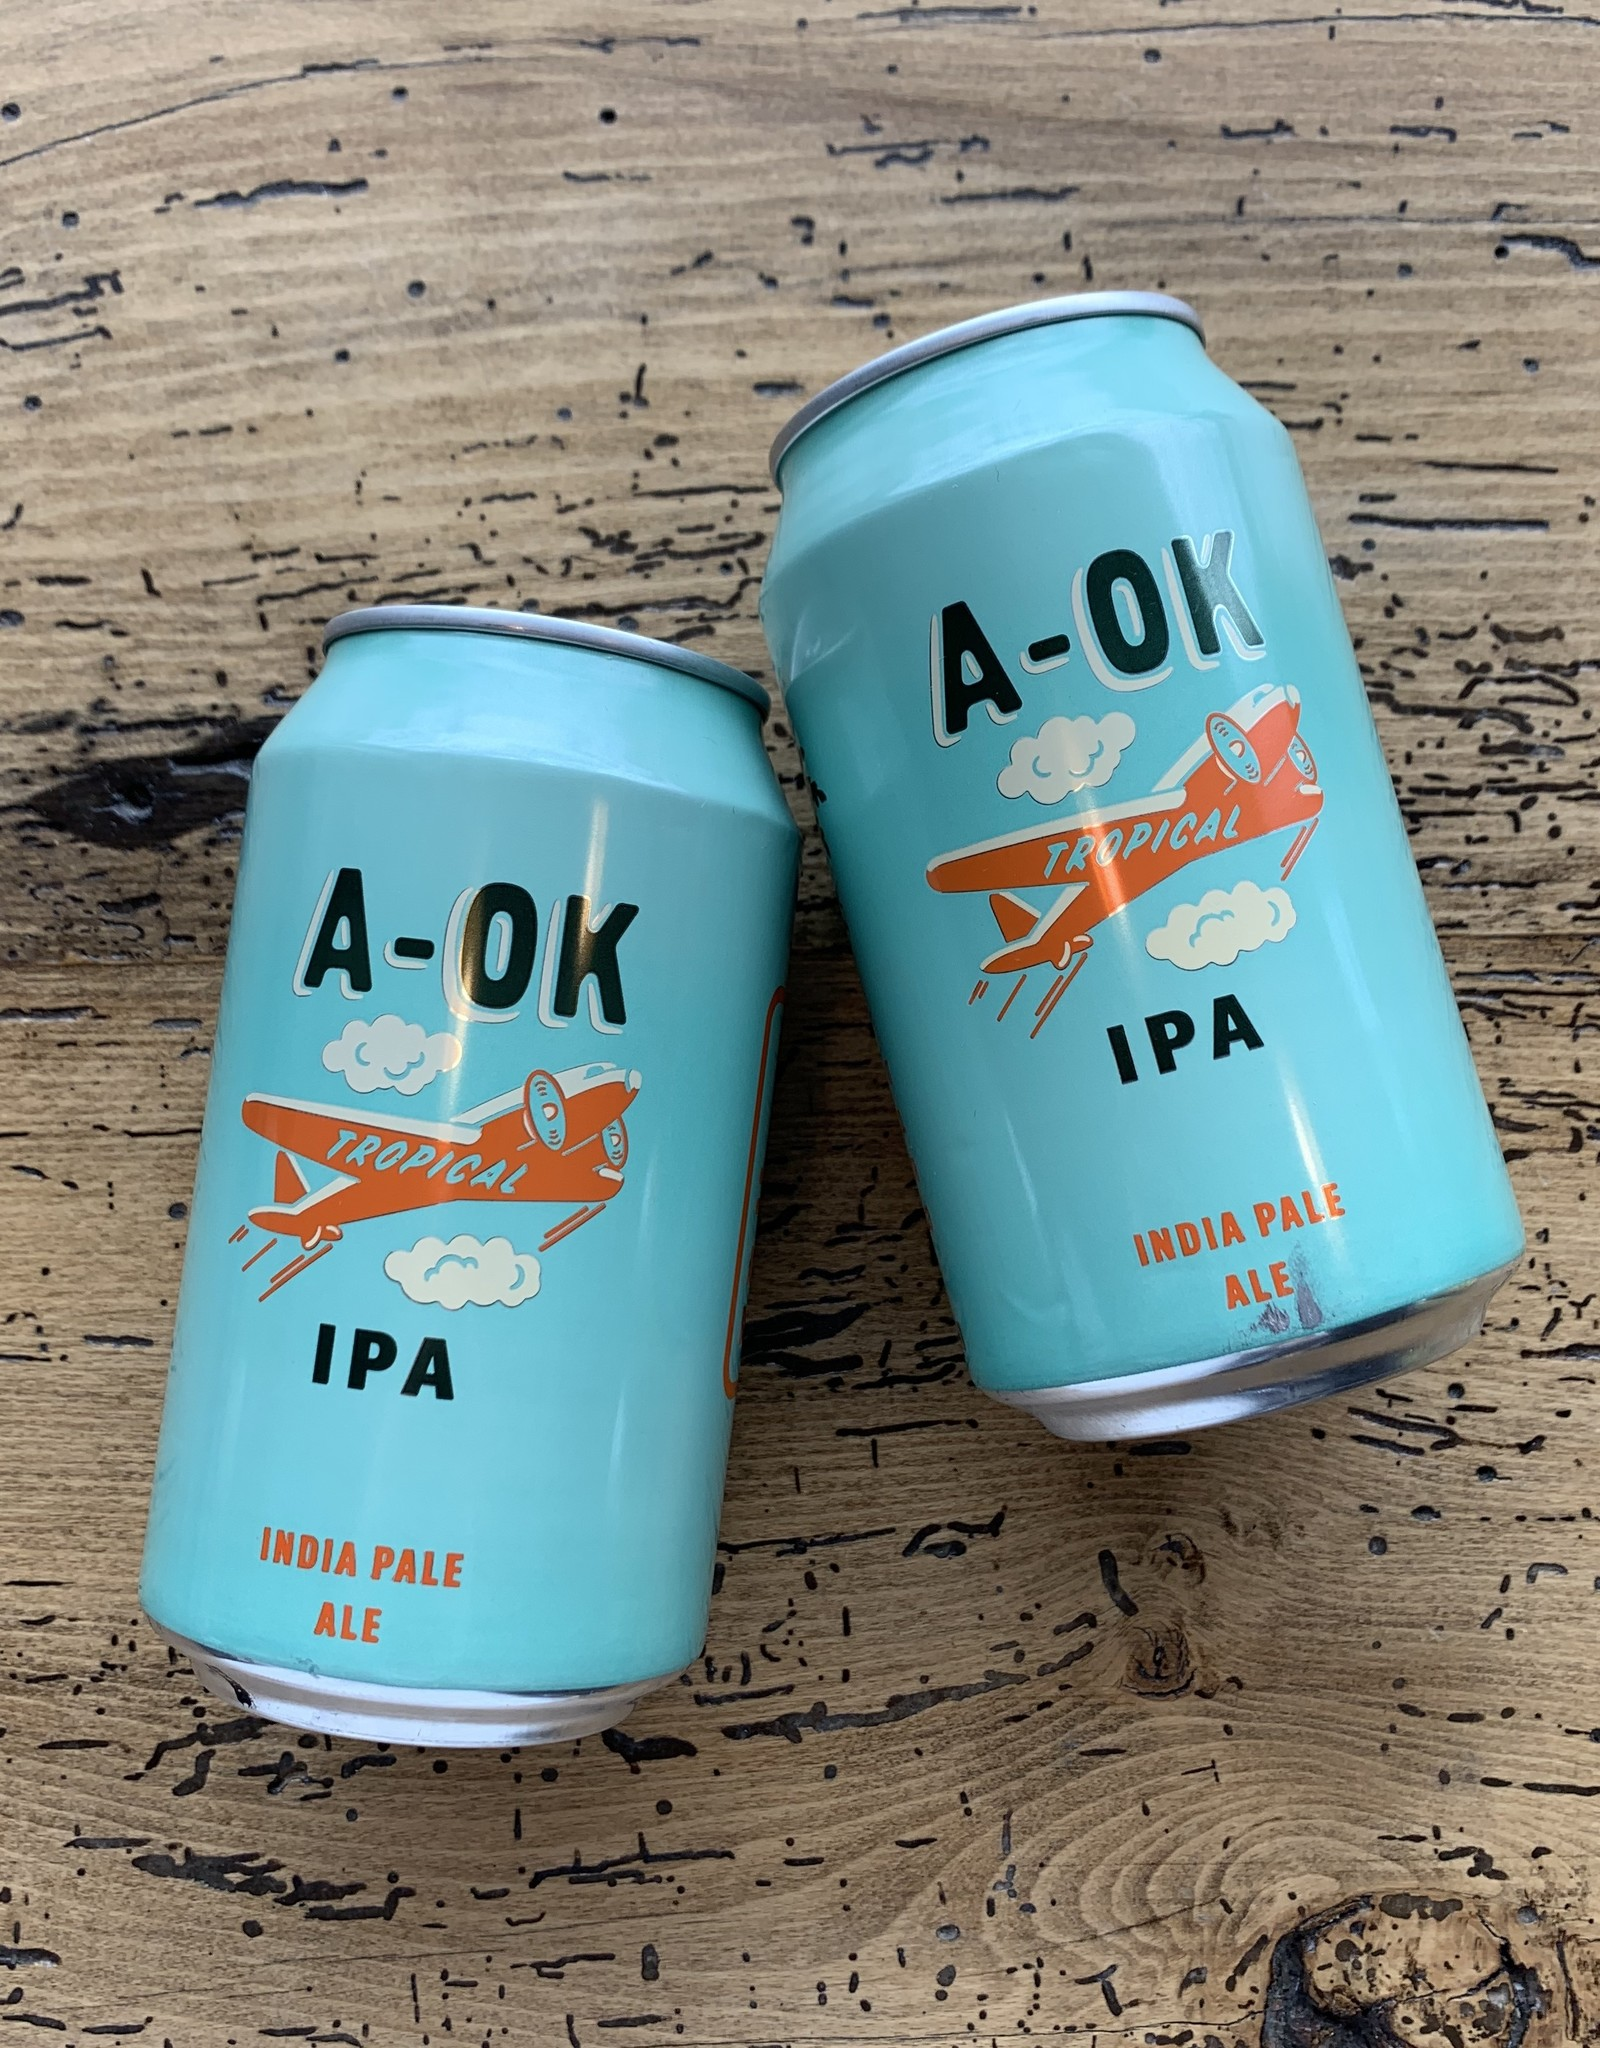 Avondale A-OK Tropical IPA 6pk